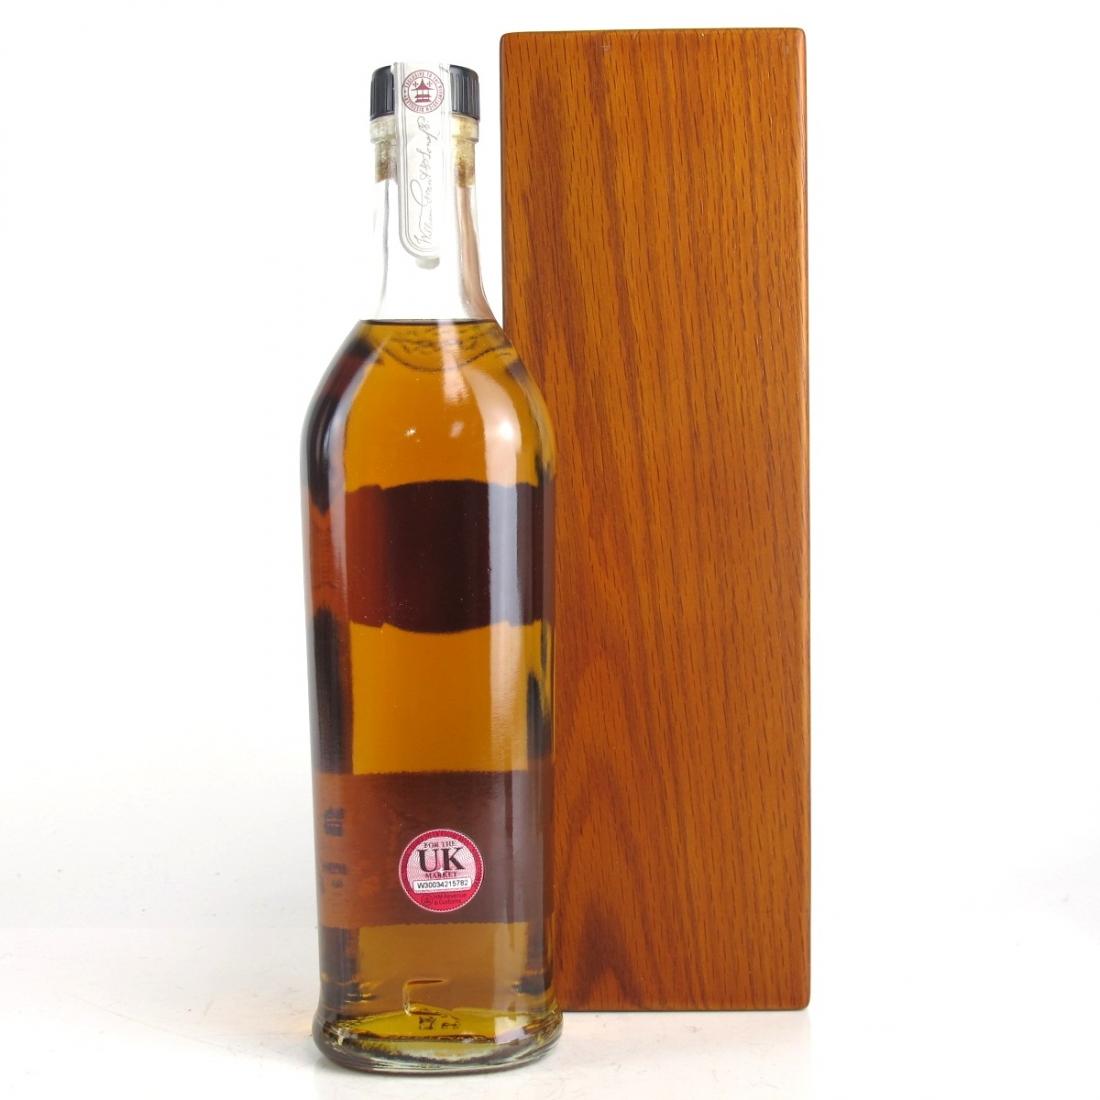 Glenfiddich 15 Year Old Hand Filled Batch #46 / Distillery Exclusive